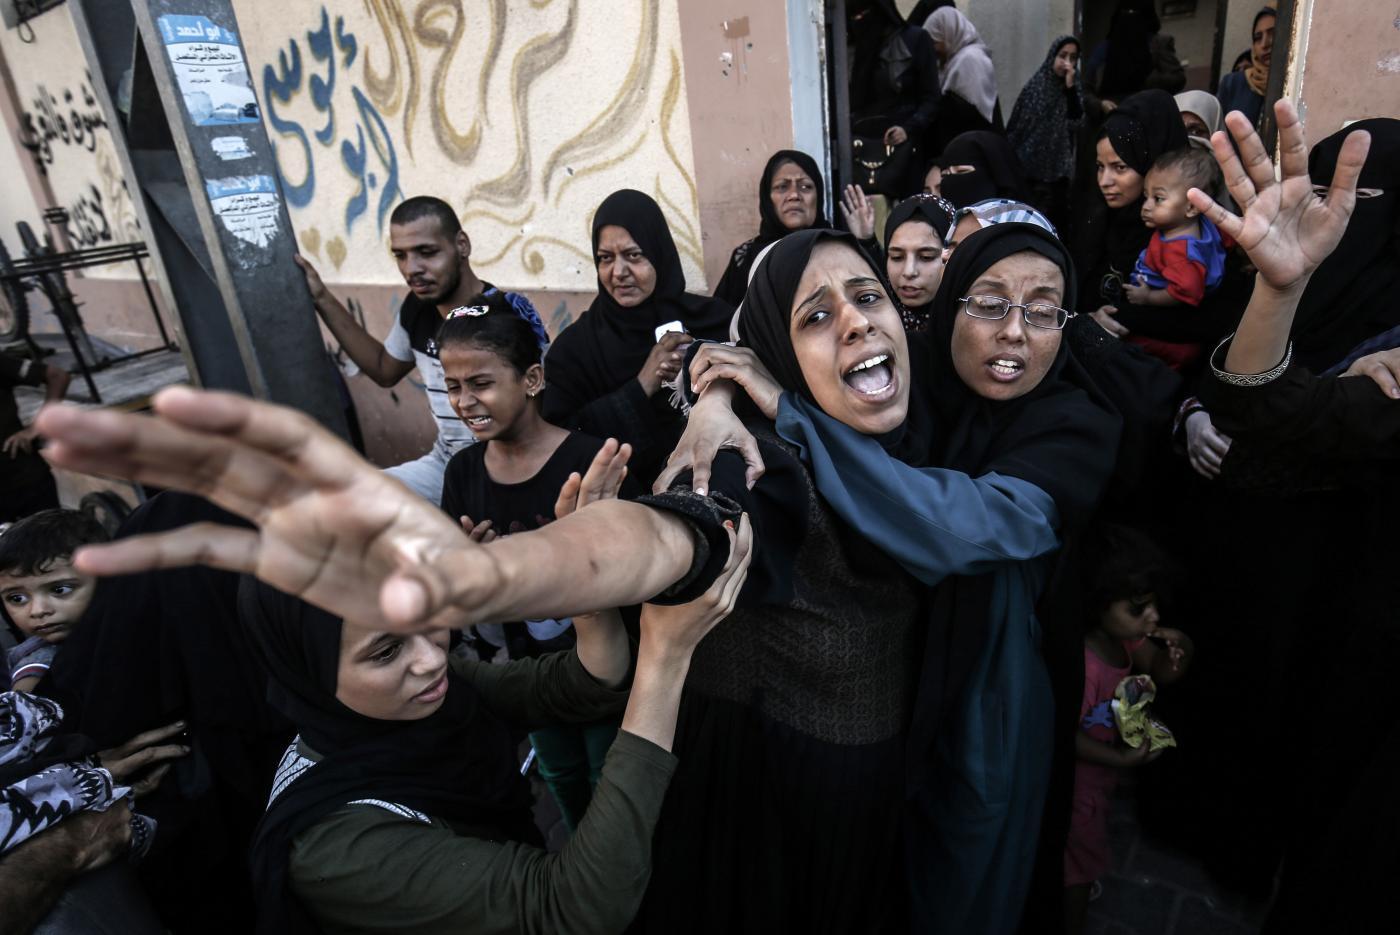 great march of return protests, siege of Gaza, Gaza blockade